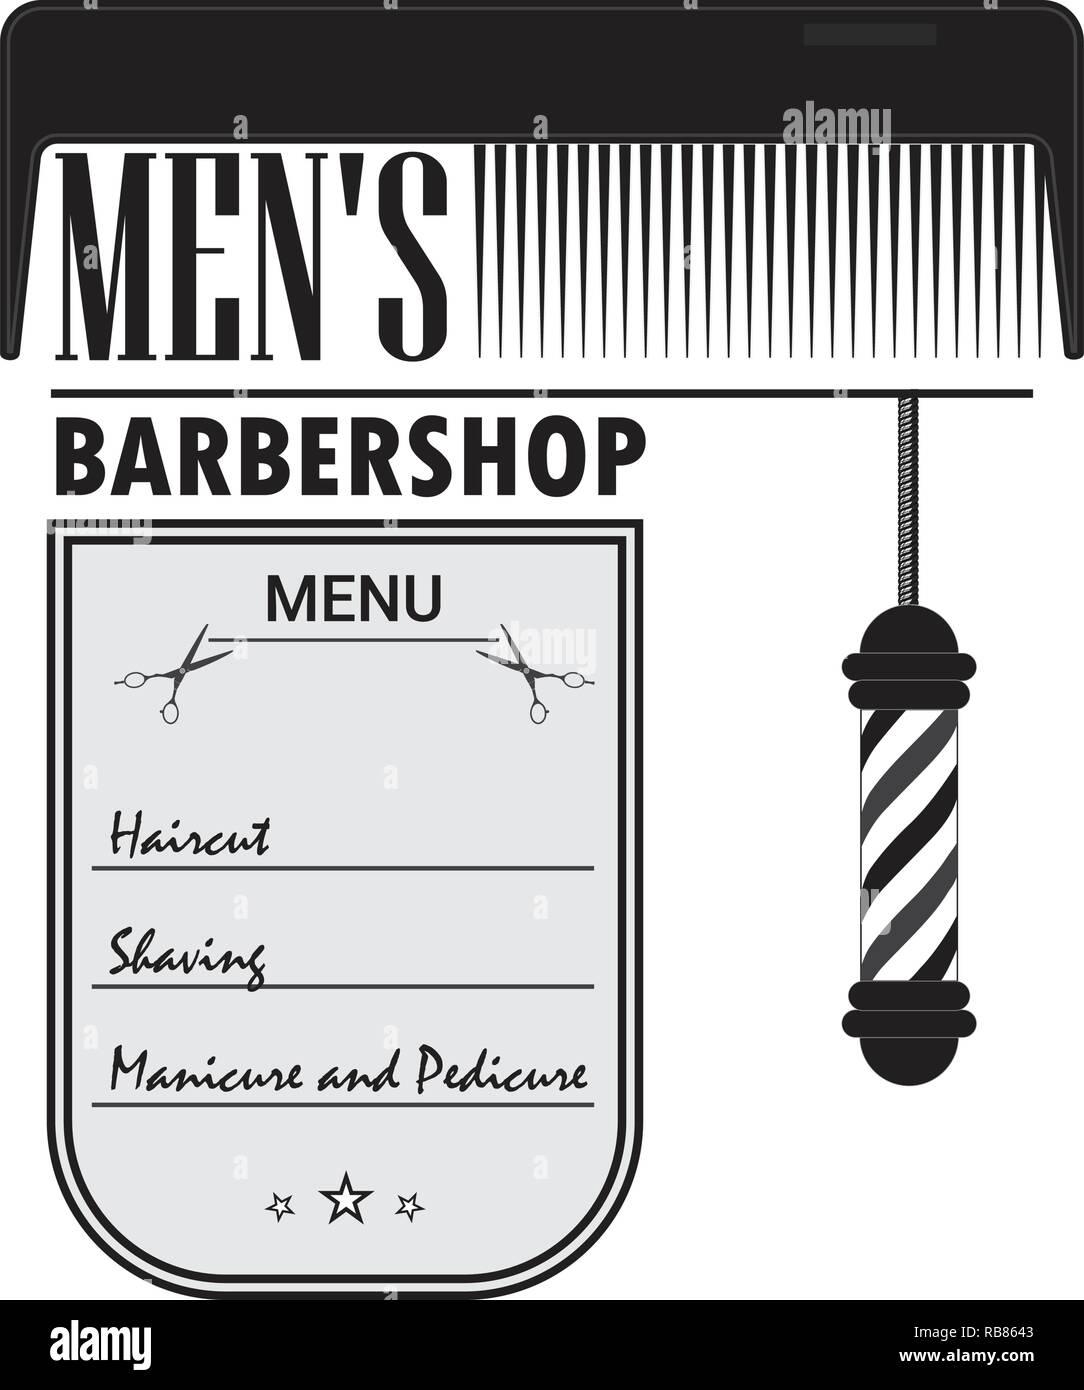 Barber Shop Signboard Stock Vector Art \u0026 Illustration